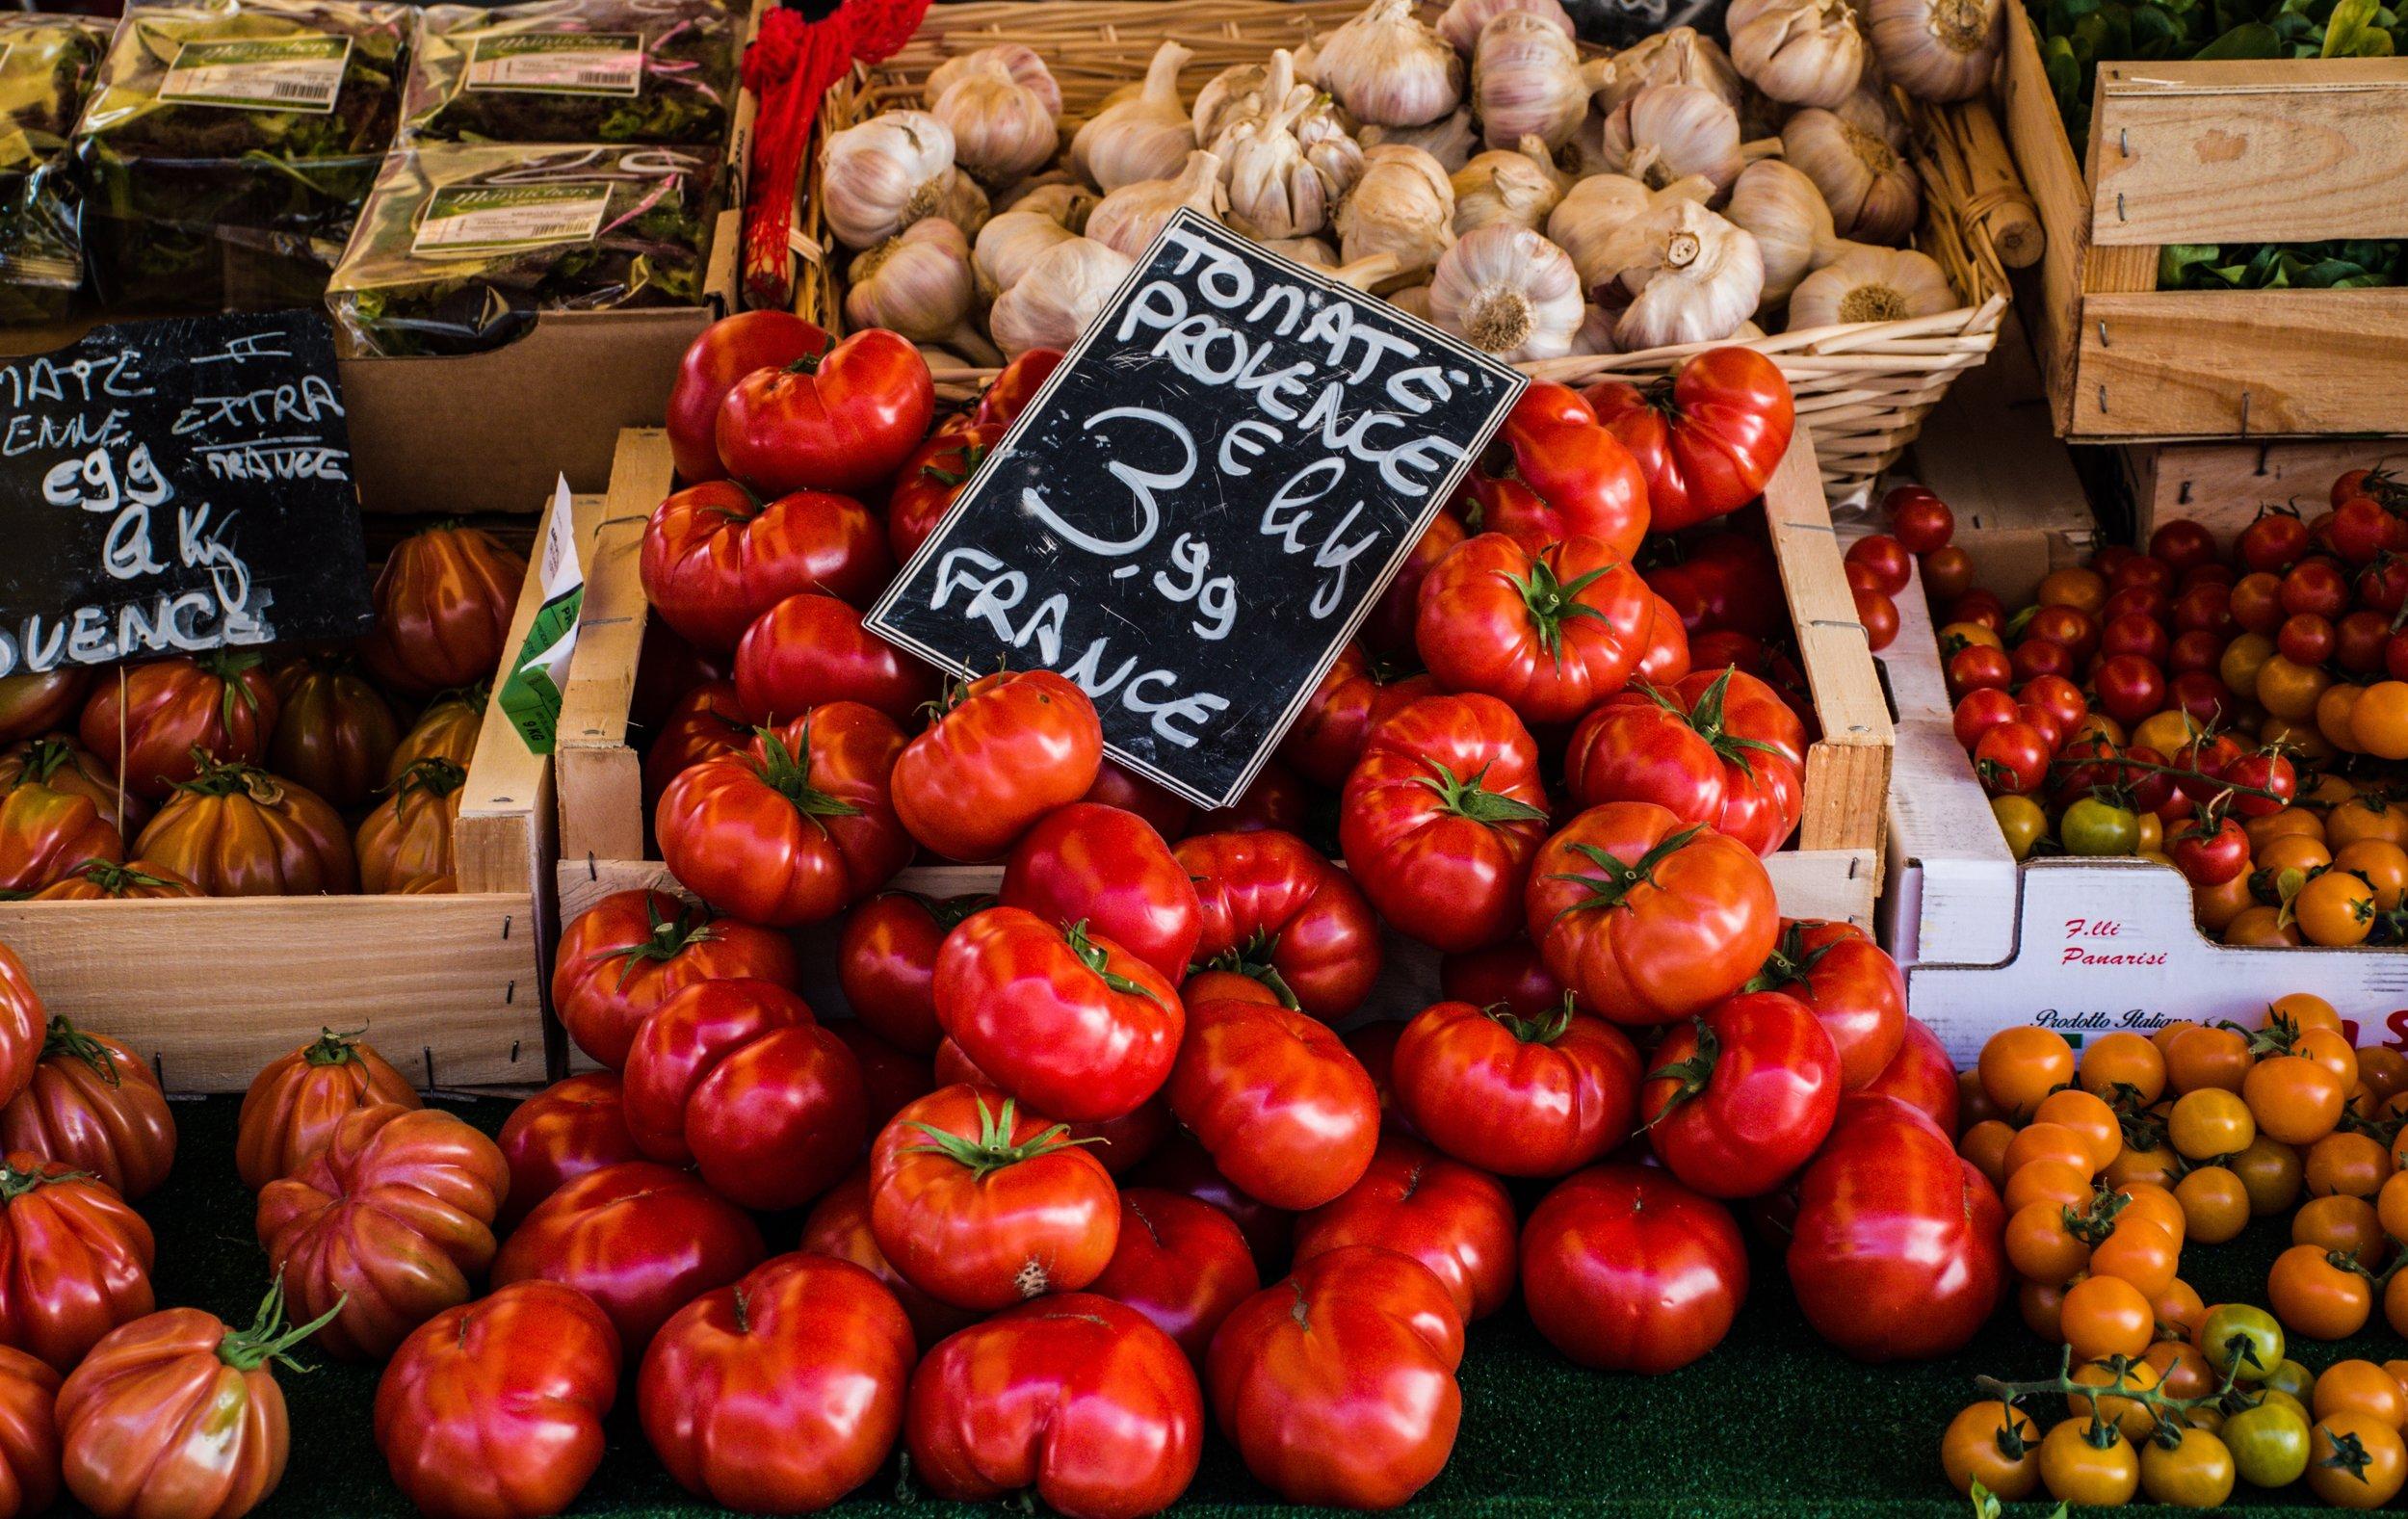 tomatoes-4050245.jpg